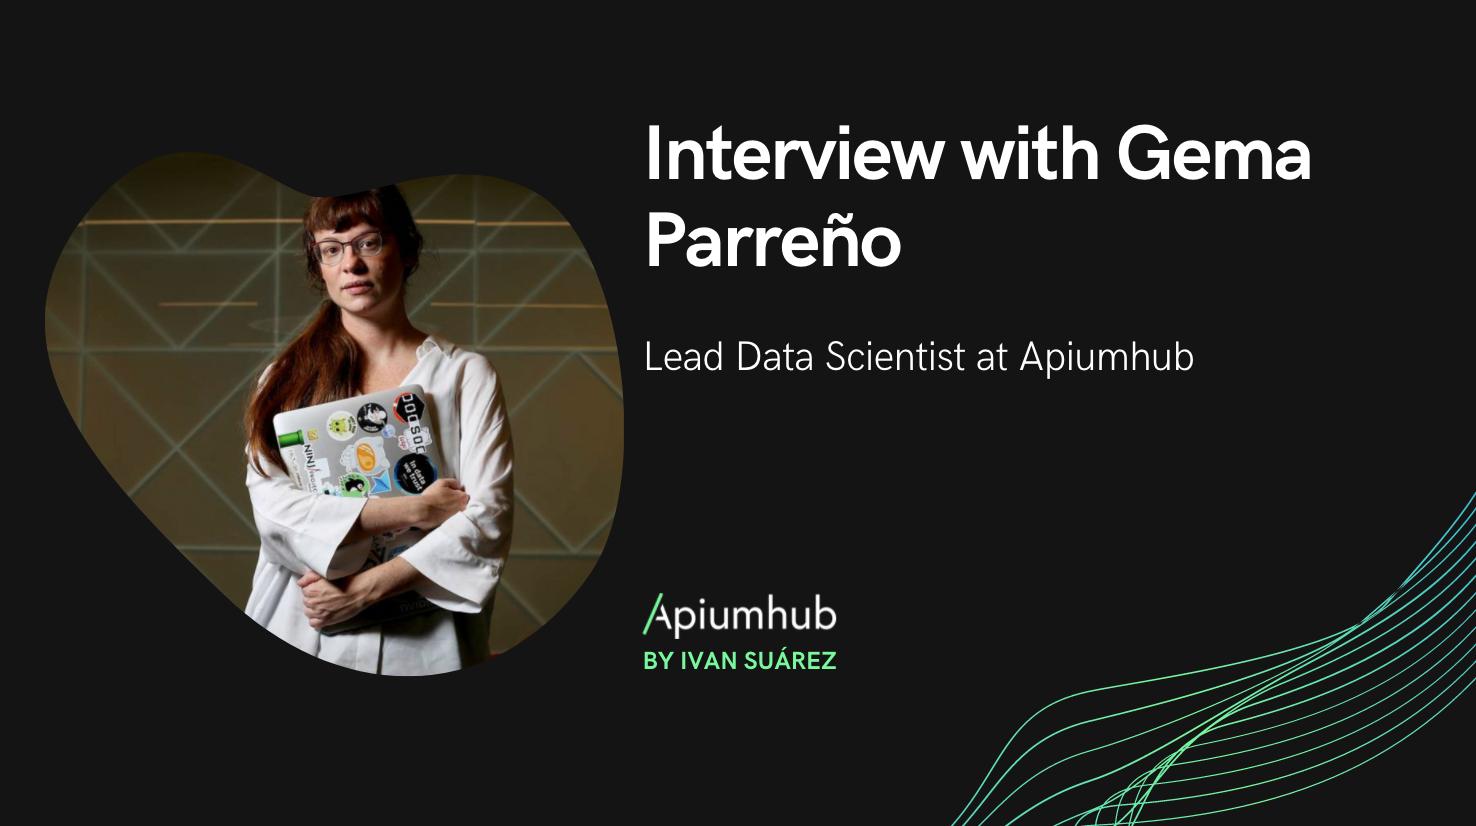 Interview with Gema Parreño, Lead Data Scientist at Apiumhub